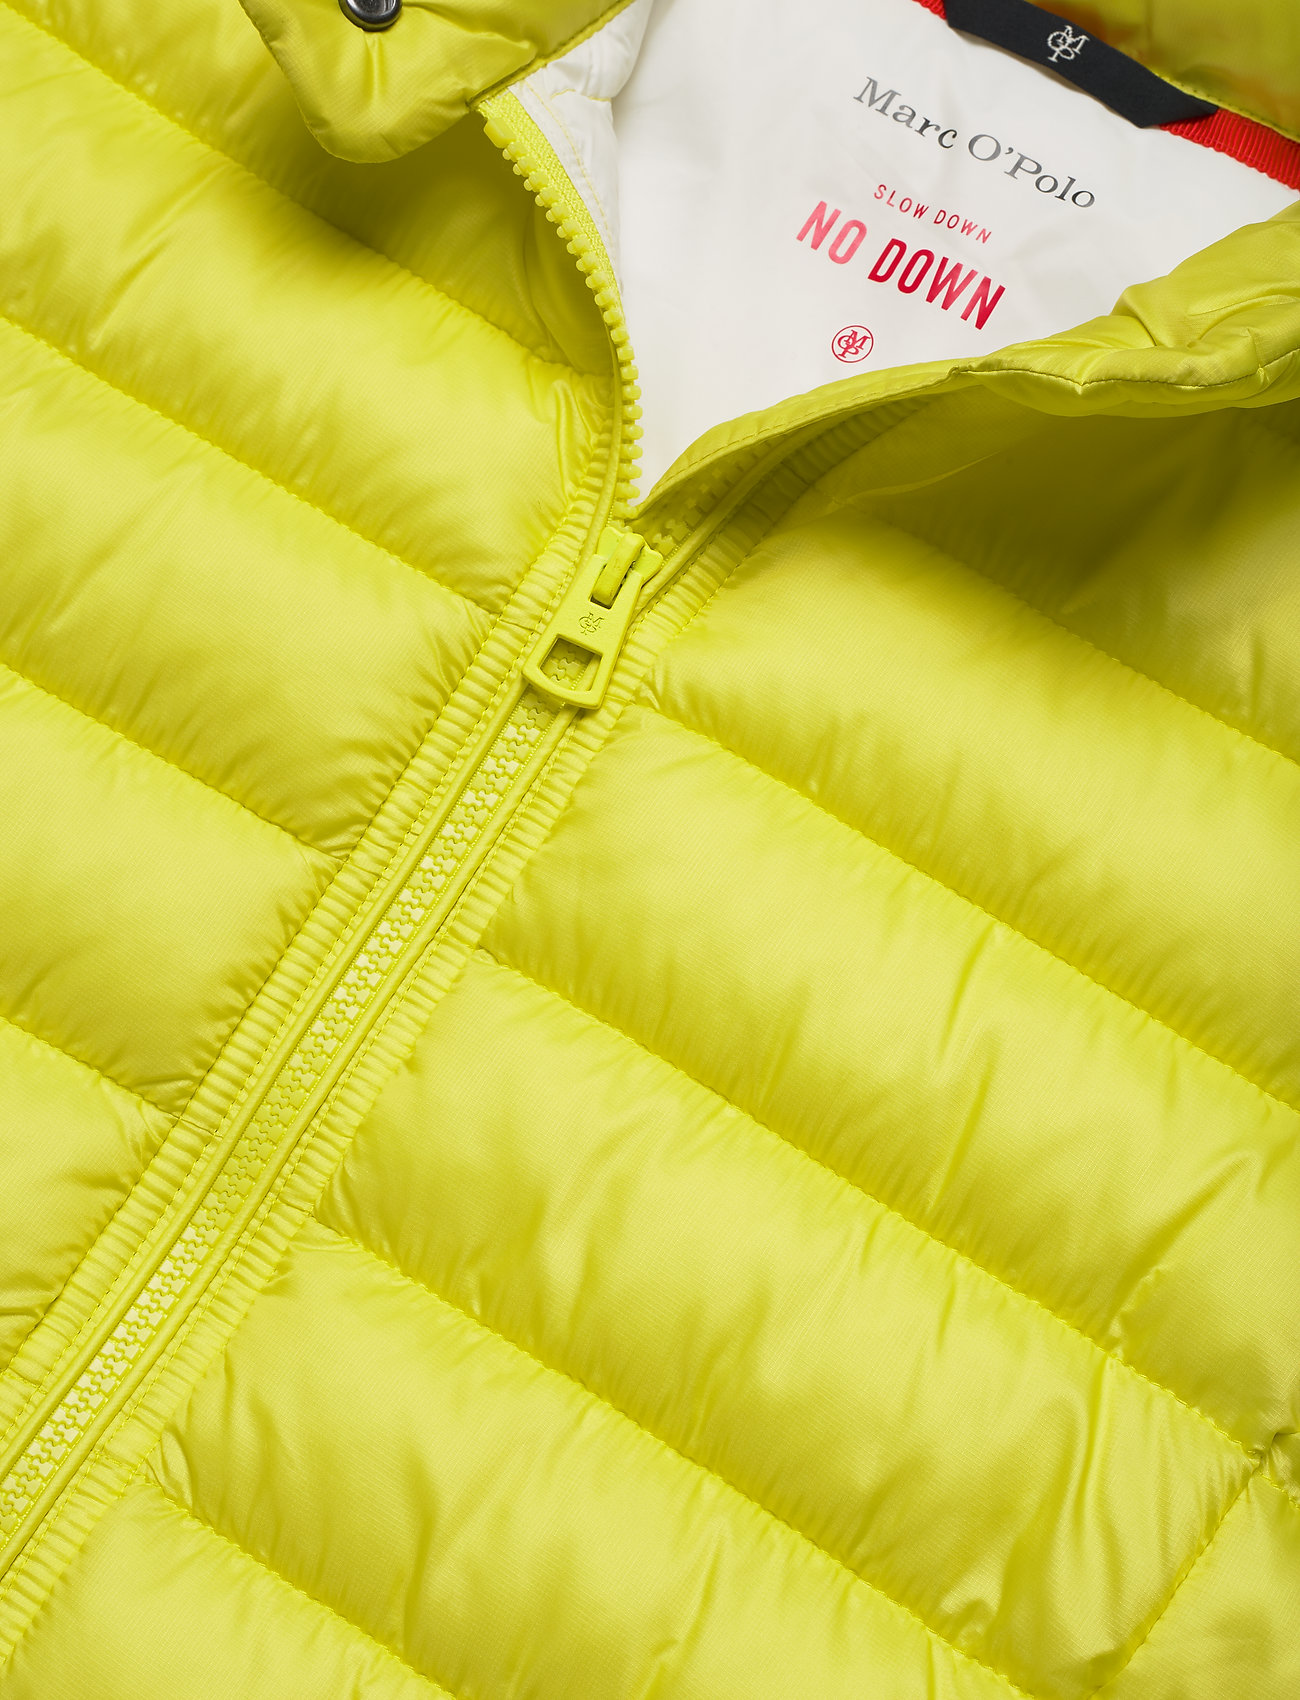 No Down Slow Down (Juicy Lime) (74.98 €) - Marc O'Polo Q1hqC